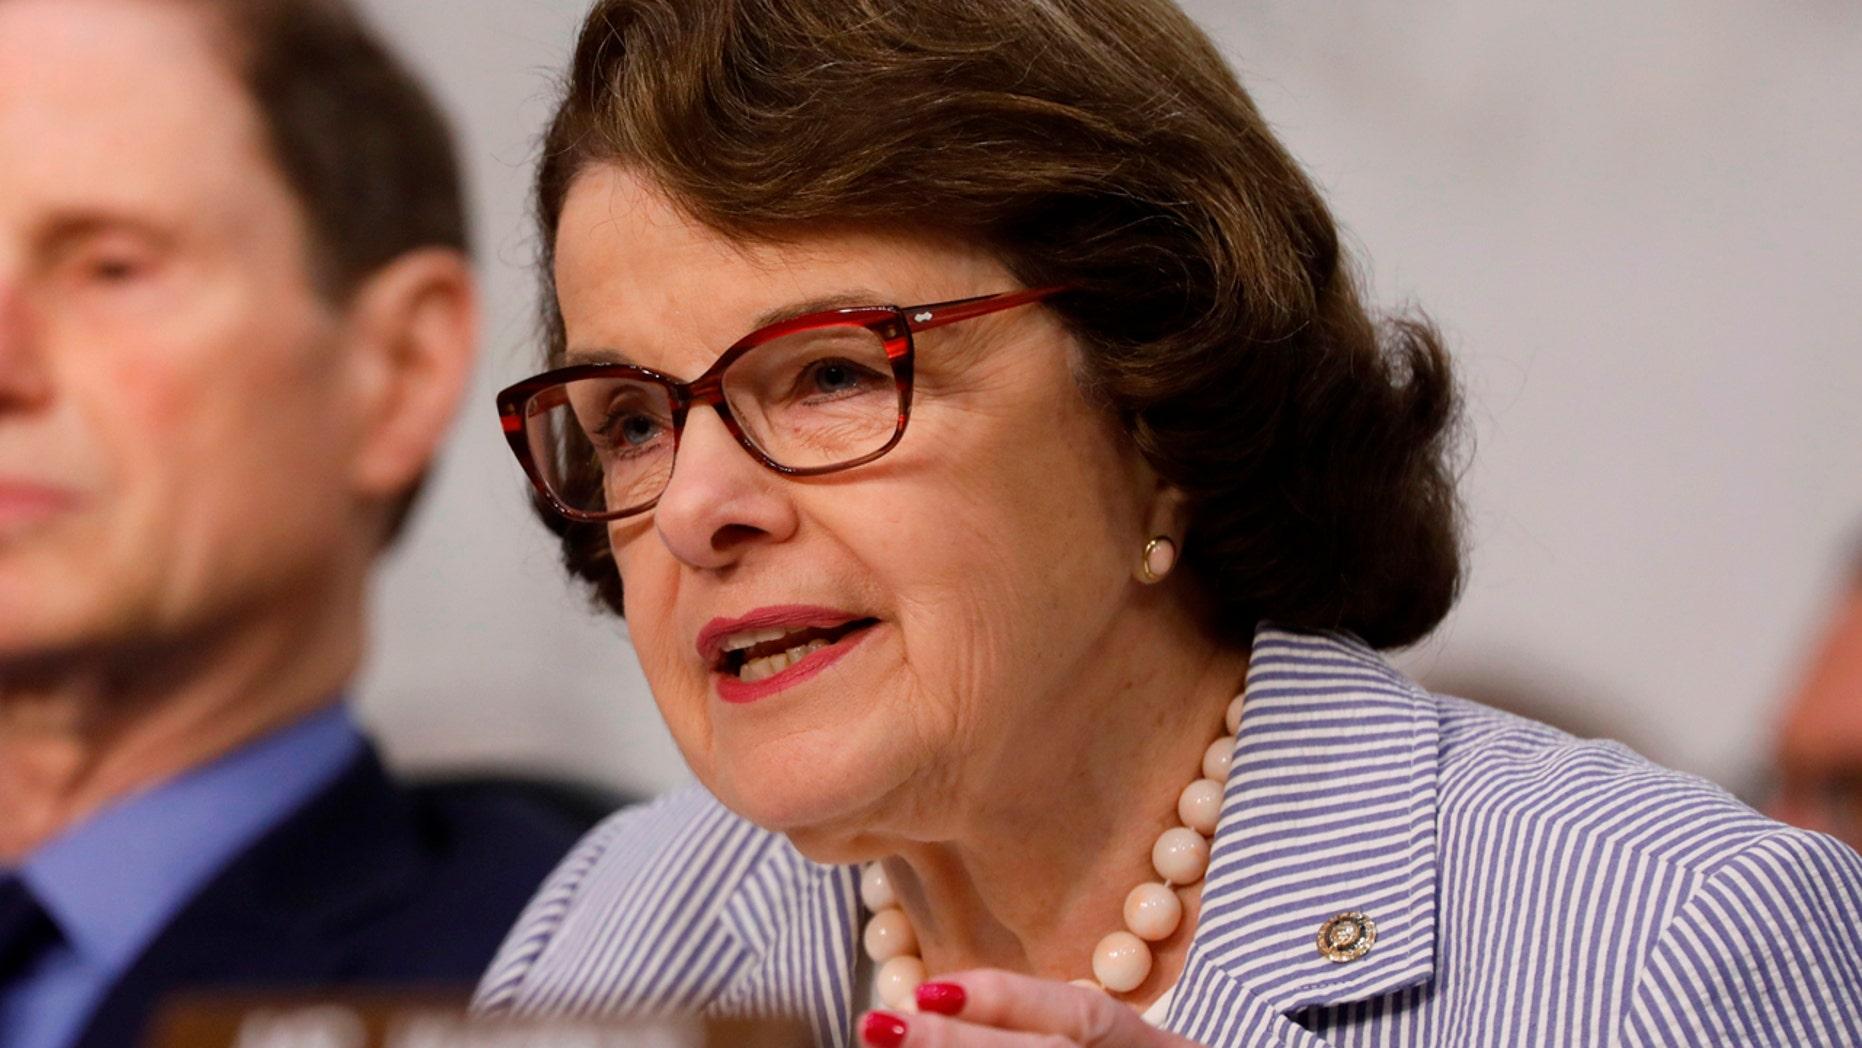 U.S. Sen. Dianne Feinstein speaks during ahearing on Capitol Hill in Washington, June 8, 2017. (Reuters)